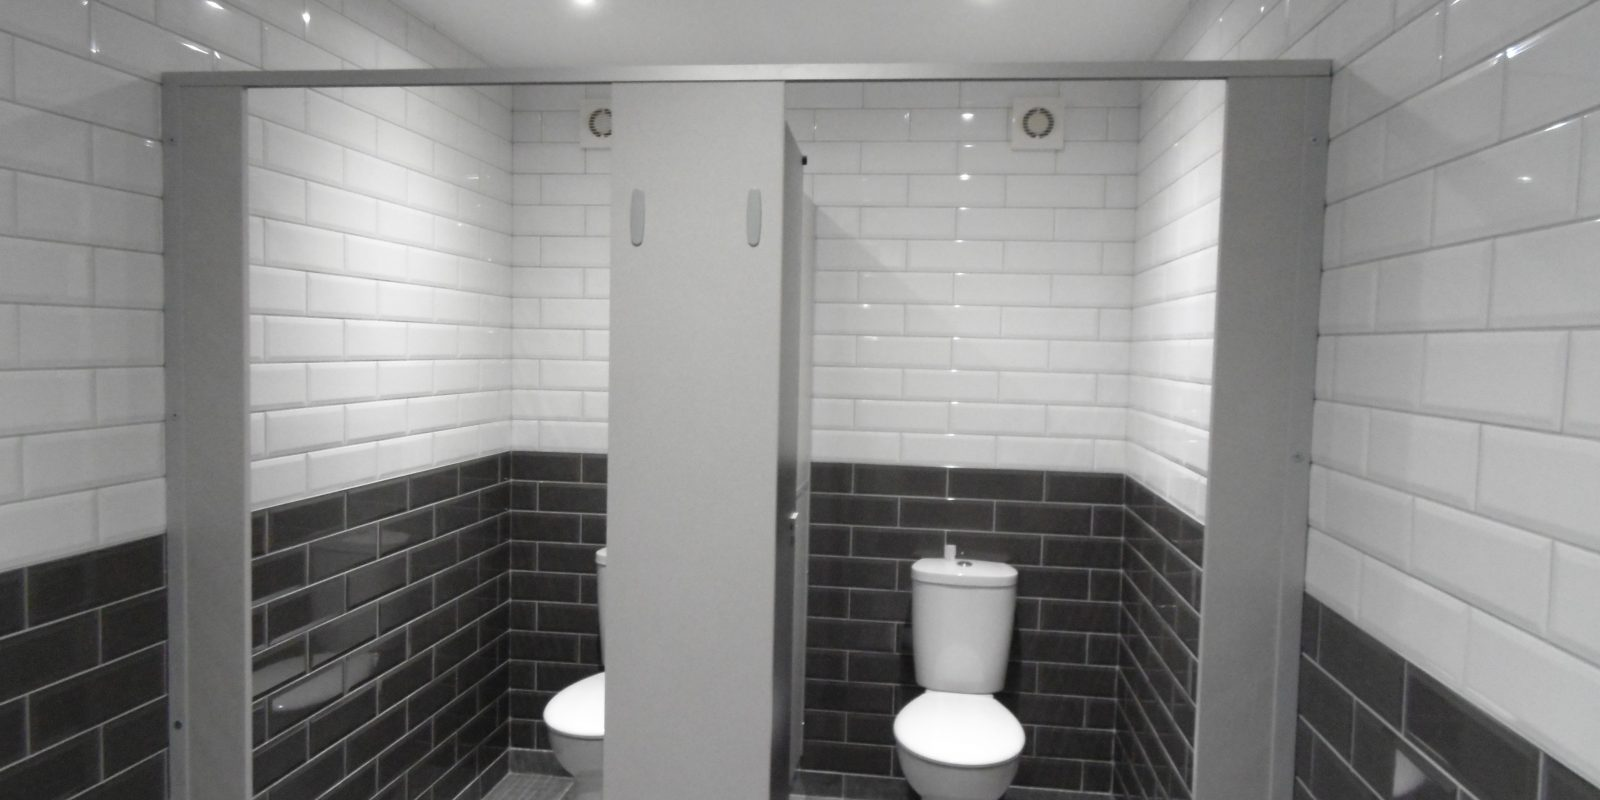 Barland Toilets